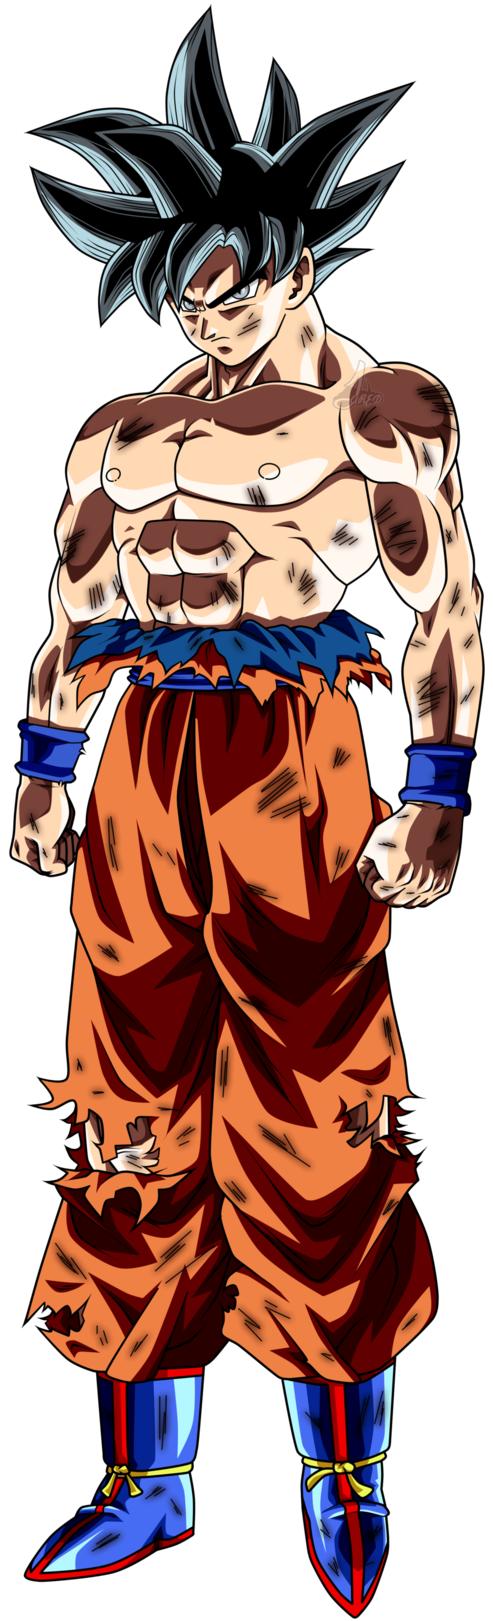 Goku Limit Breaker Anime Desenho De Ninja Desenhos Deadpool